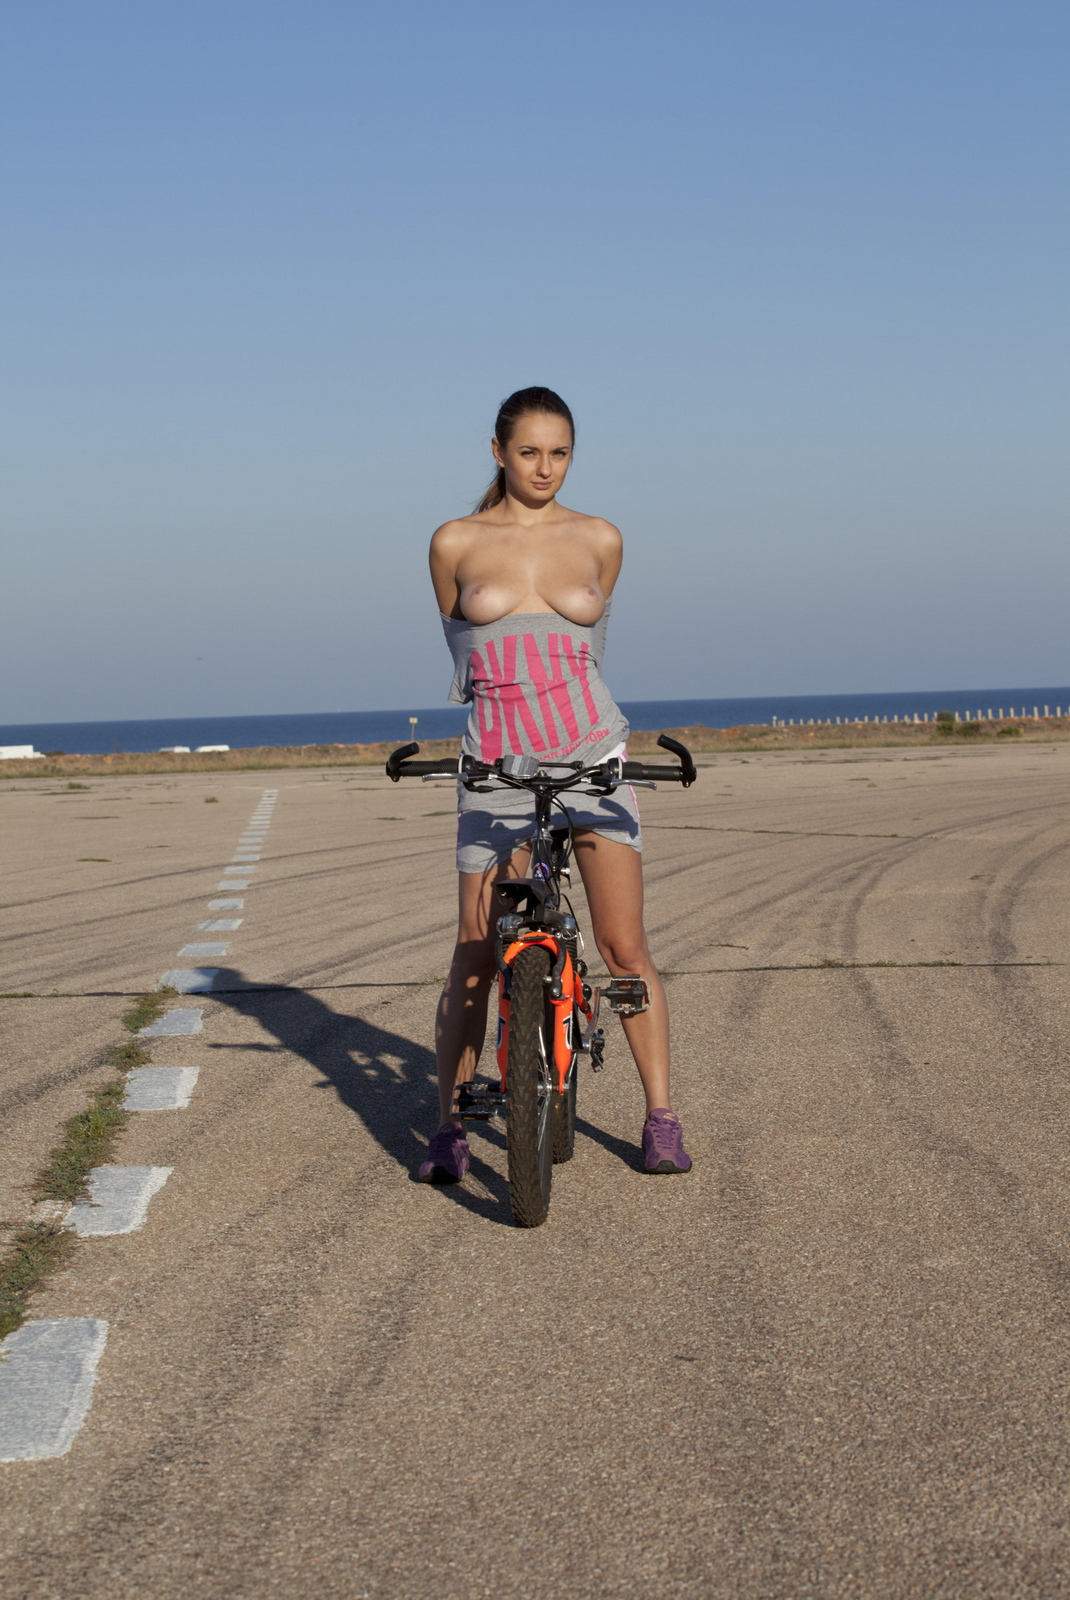 mishel-c-bicycle-boobs-naked-domai-03